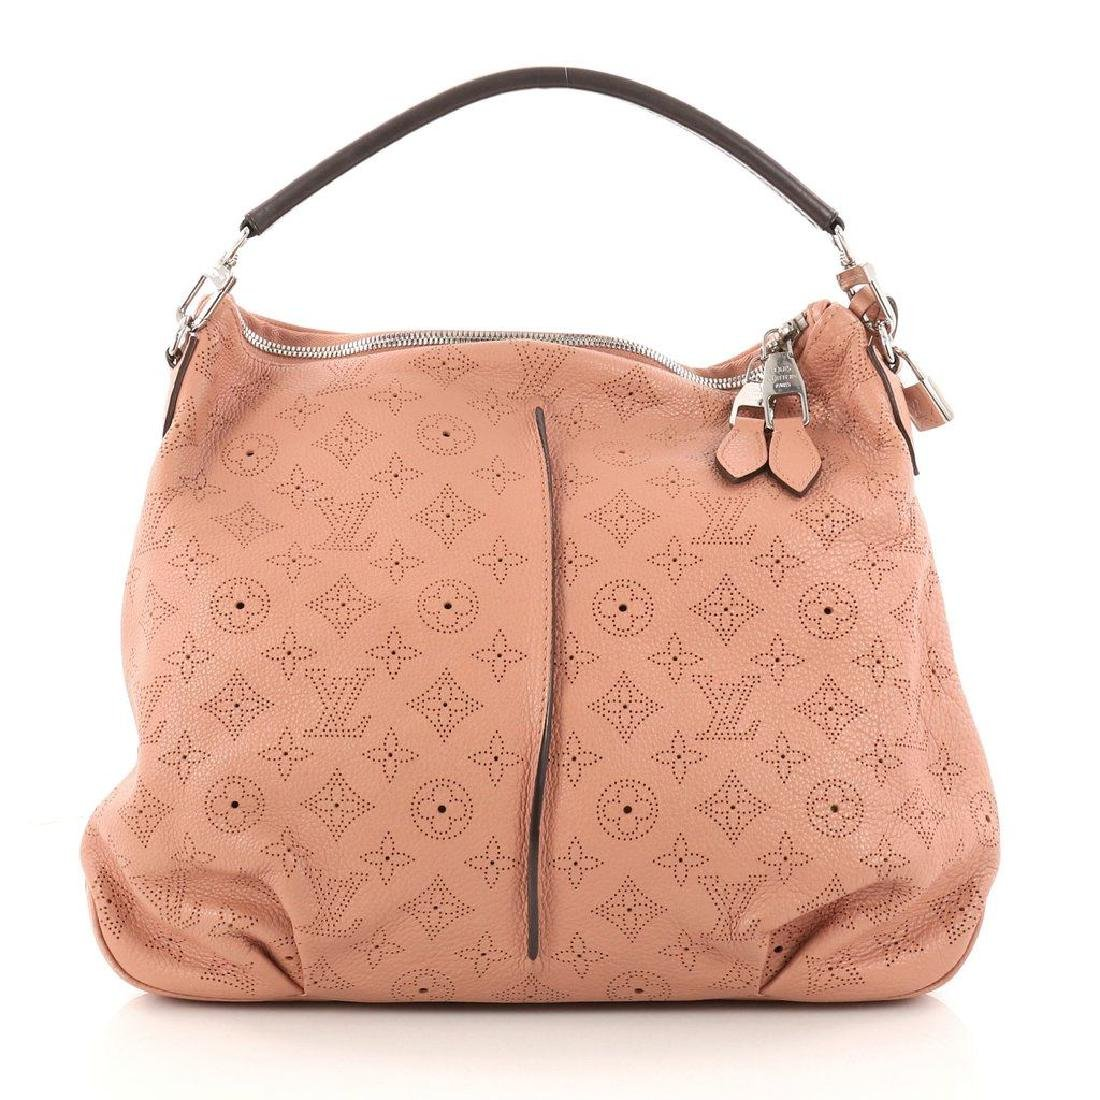 Louis Vuitton Selene Mahina Handbag Pm Pink Salmon - 2